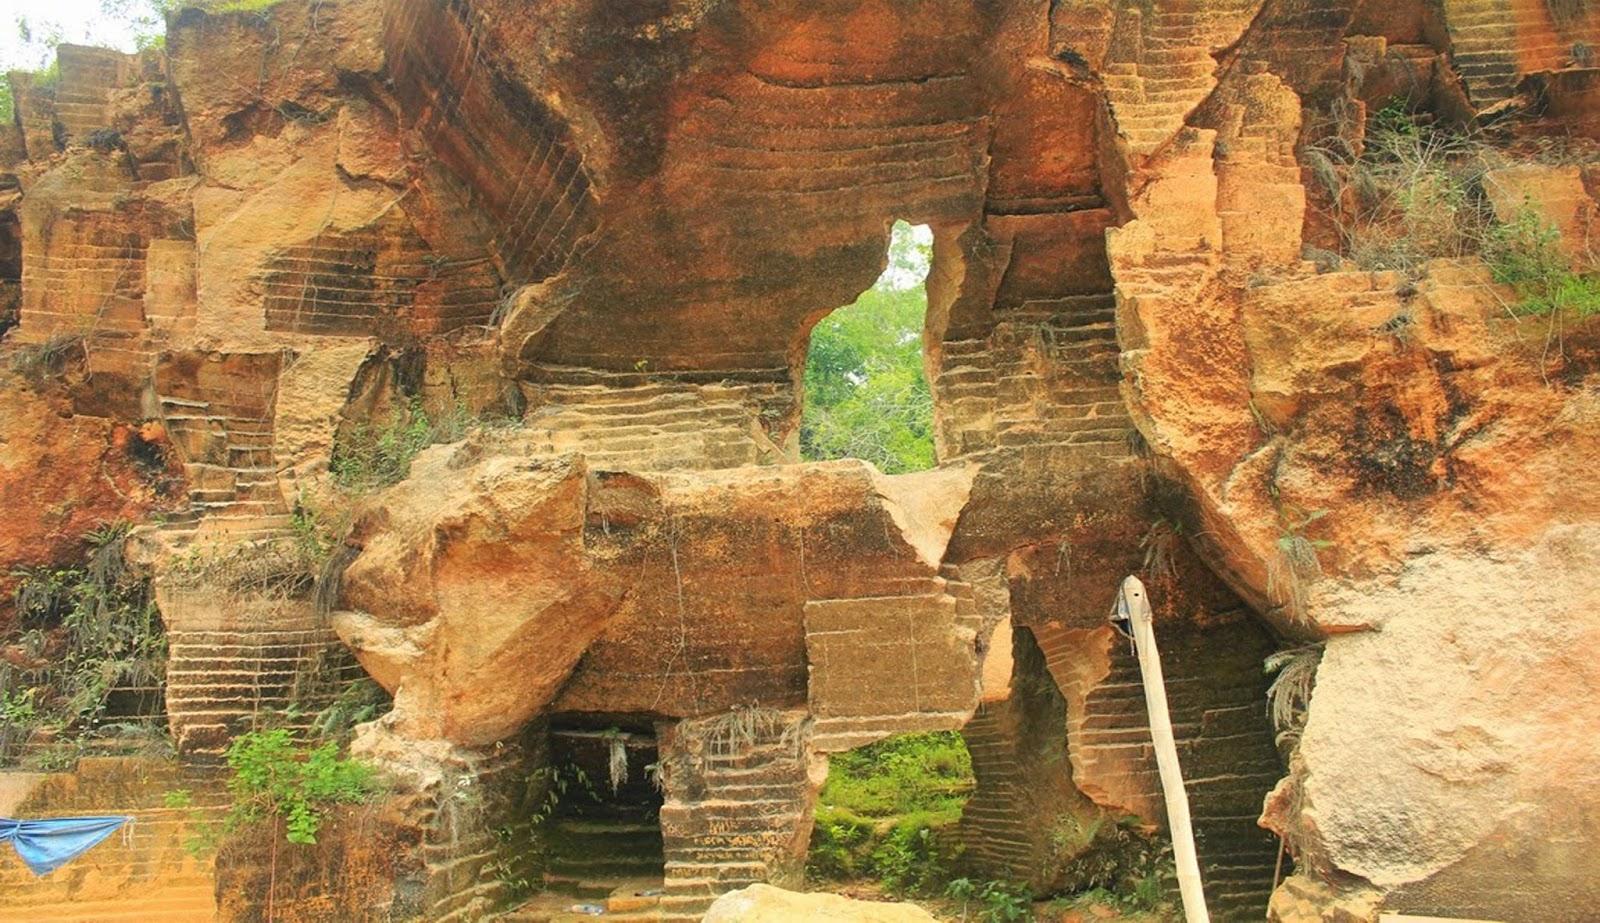 Wisata Bangkalan Madura Kita Ketahui Tempat Bukit Geger Kab